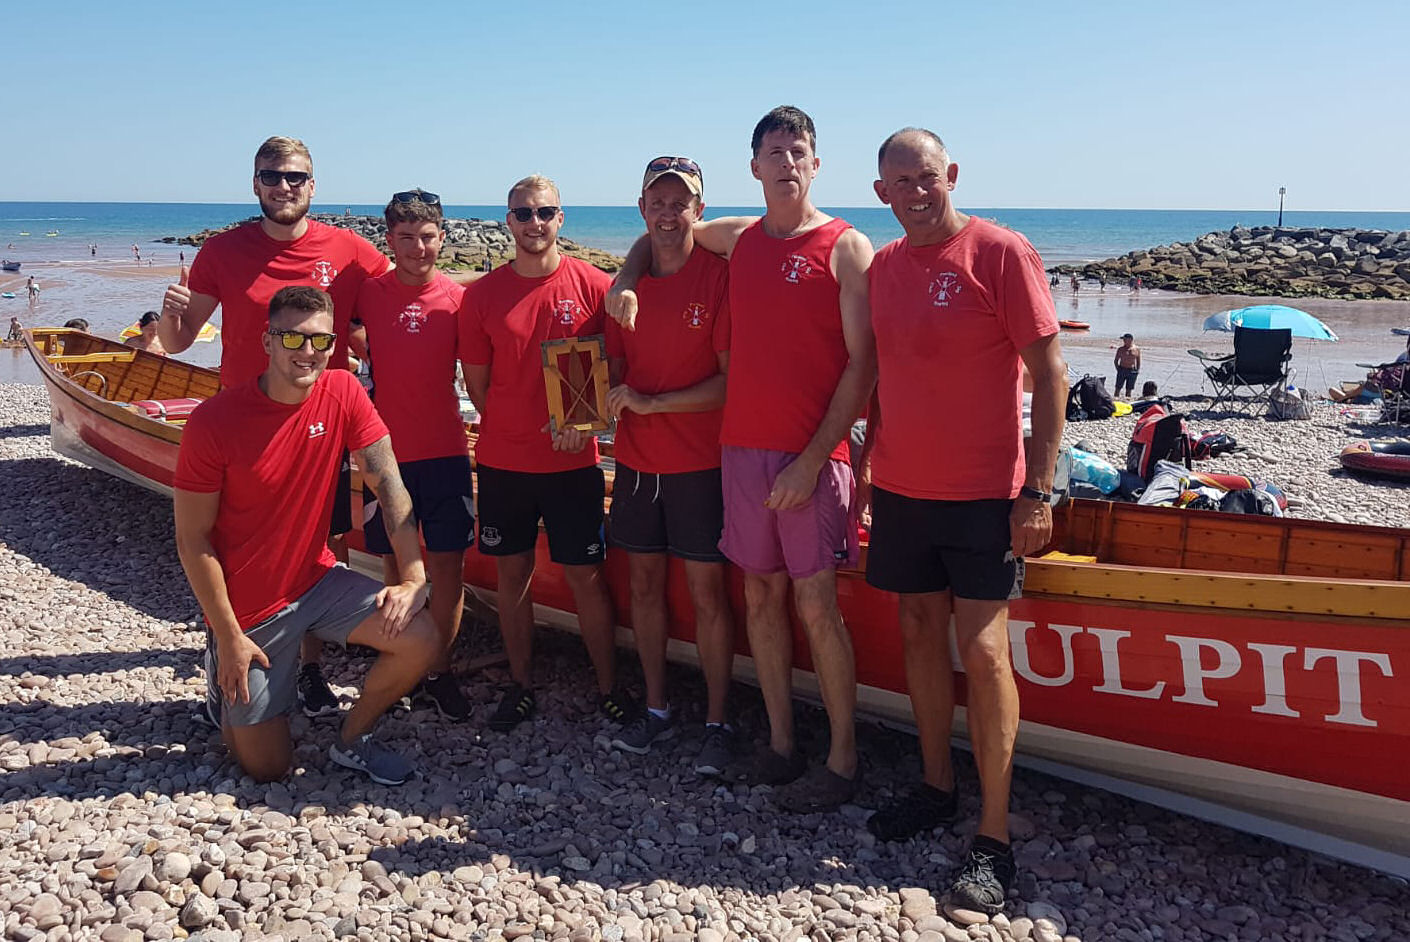 Sidmouth Regatta 2018